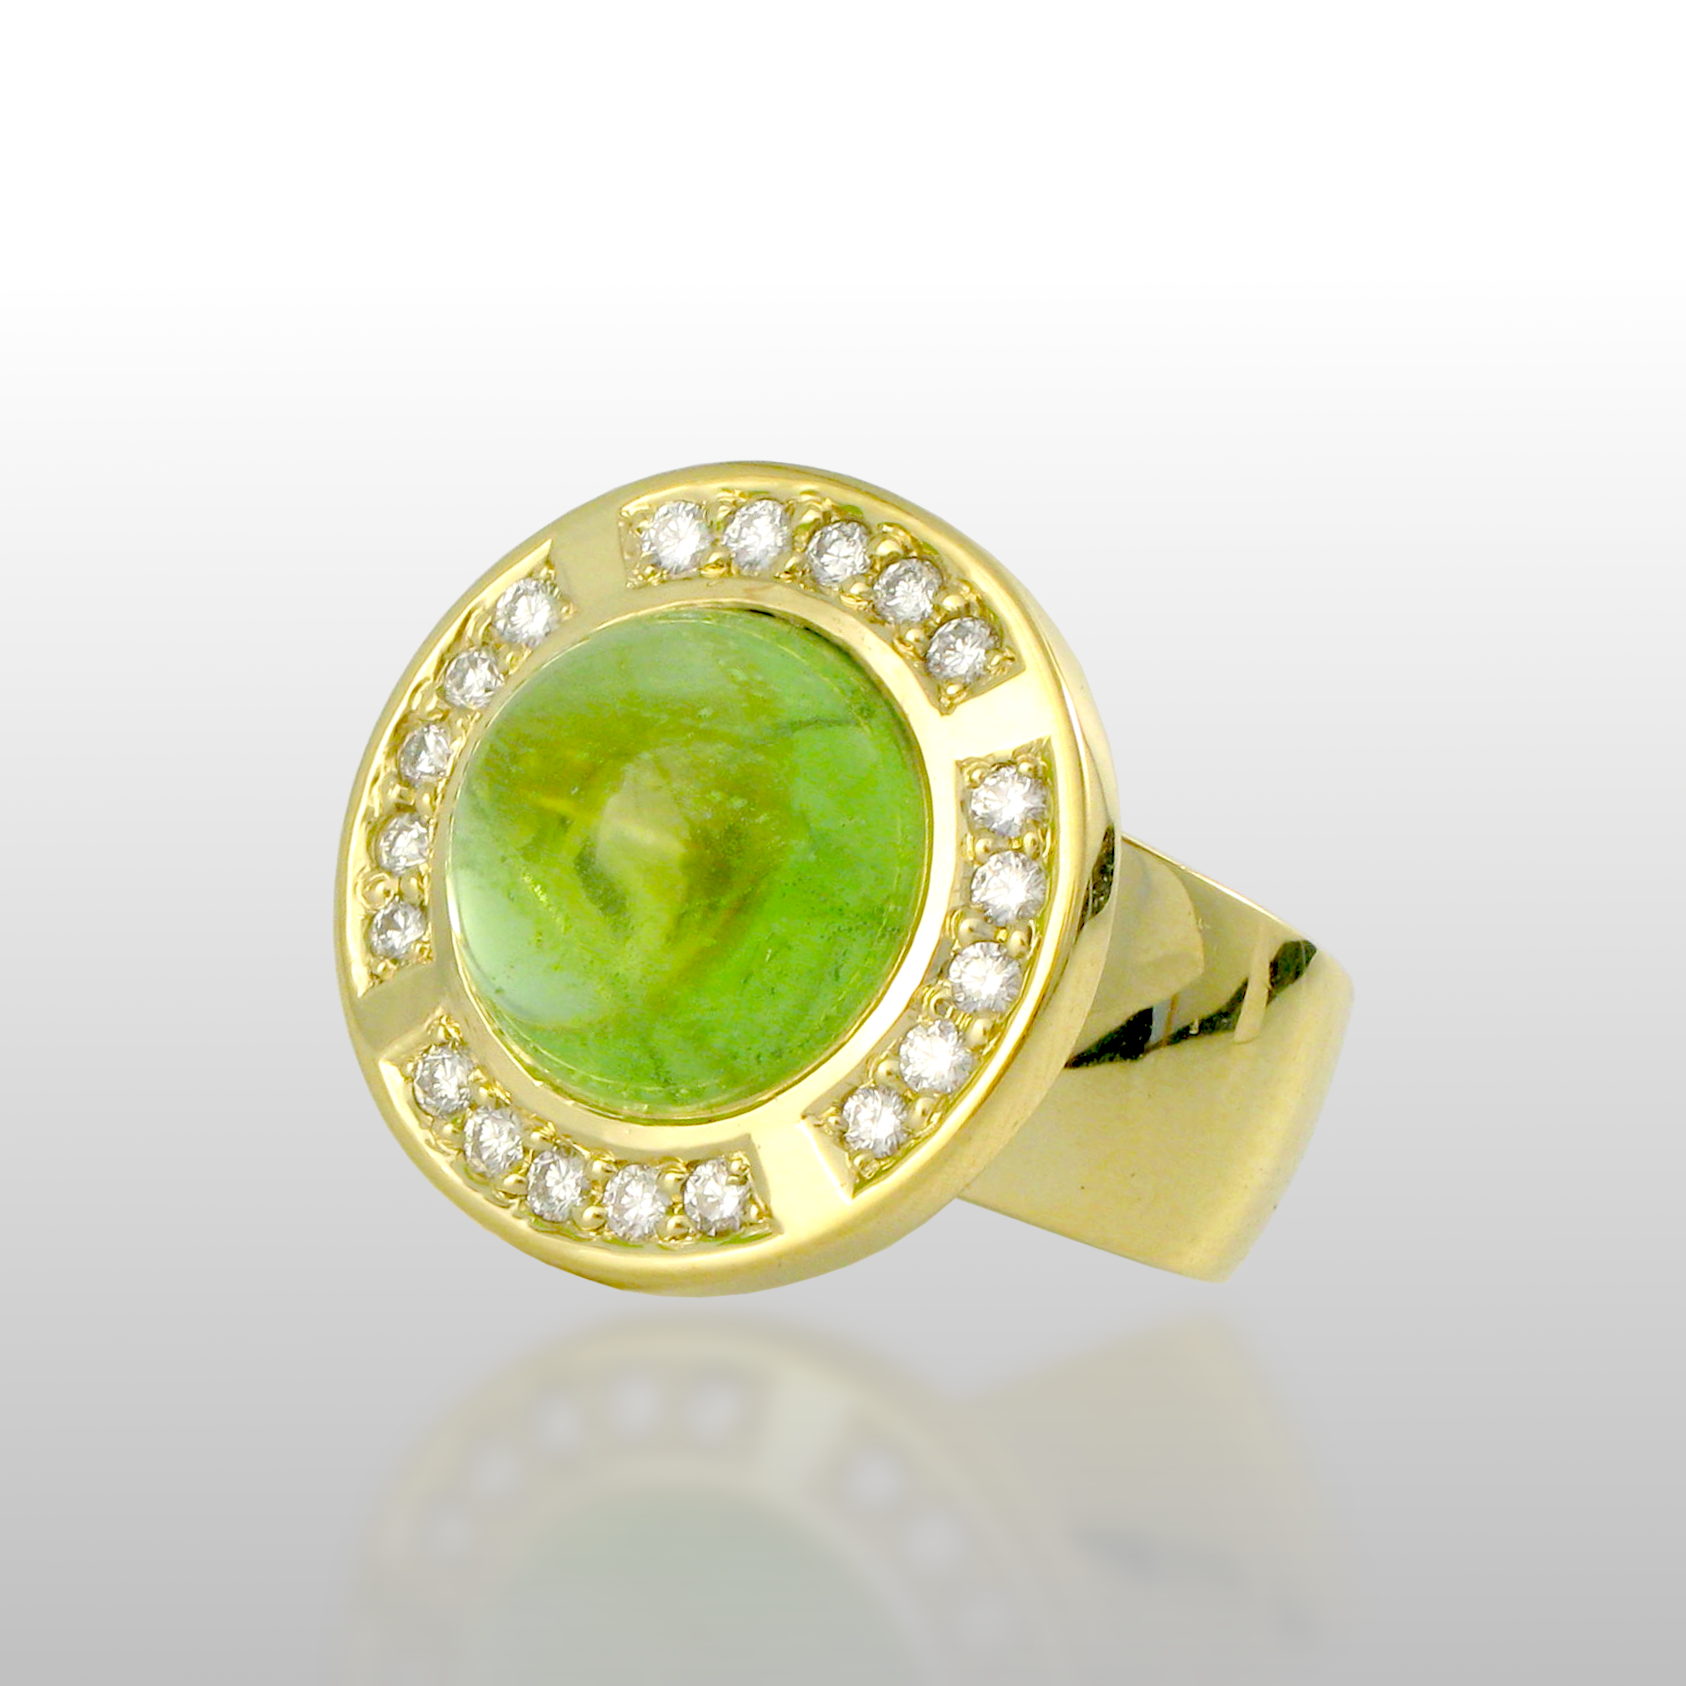 "Unique 18k gold ring ""Orbit"" with peridot and diamonds by Pratima Design Fine Art Jewelry"